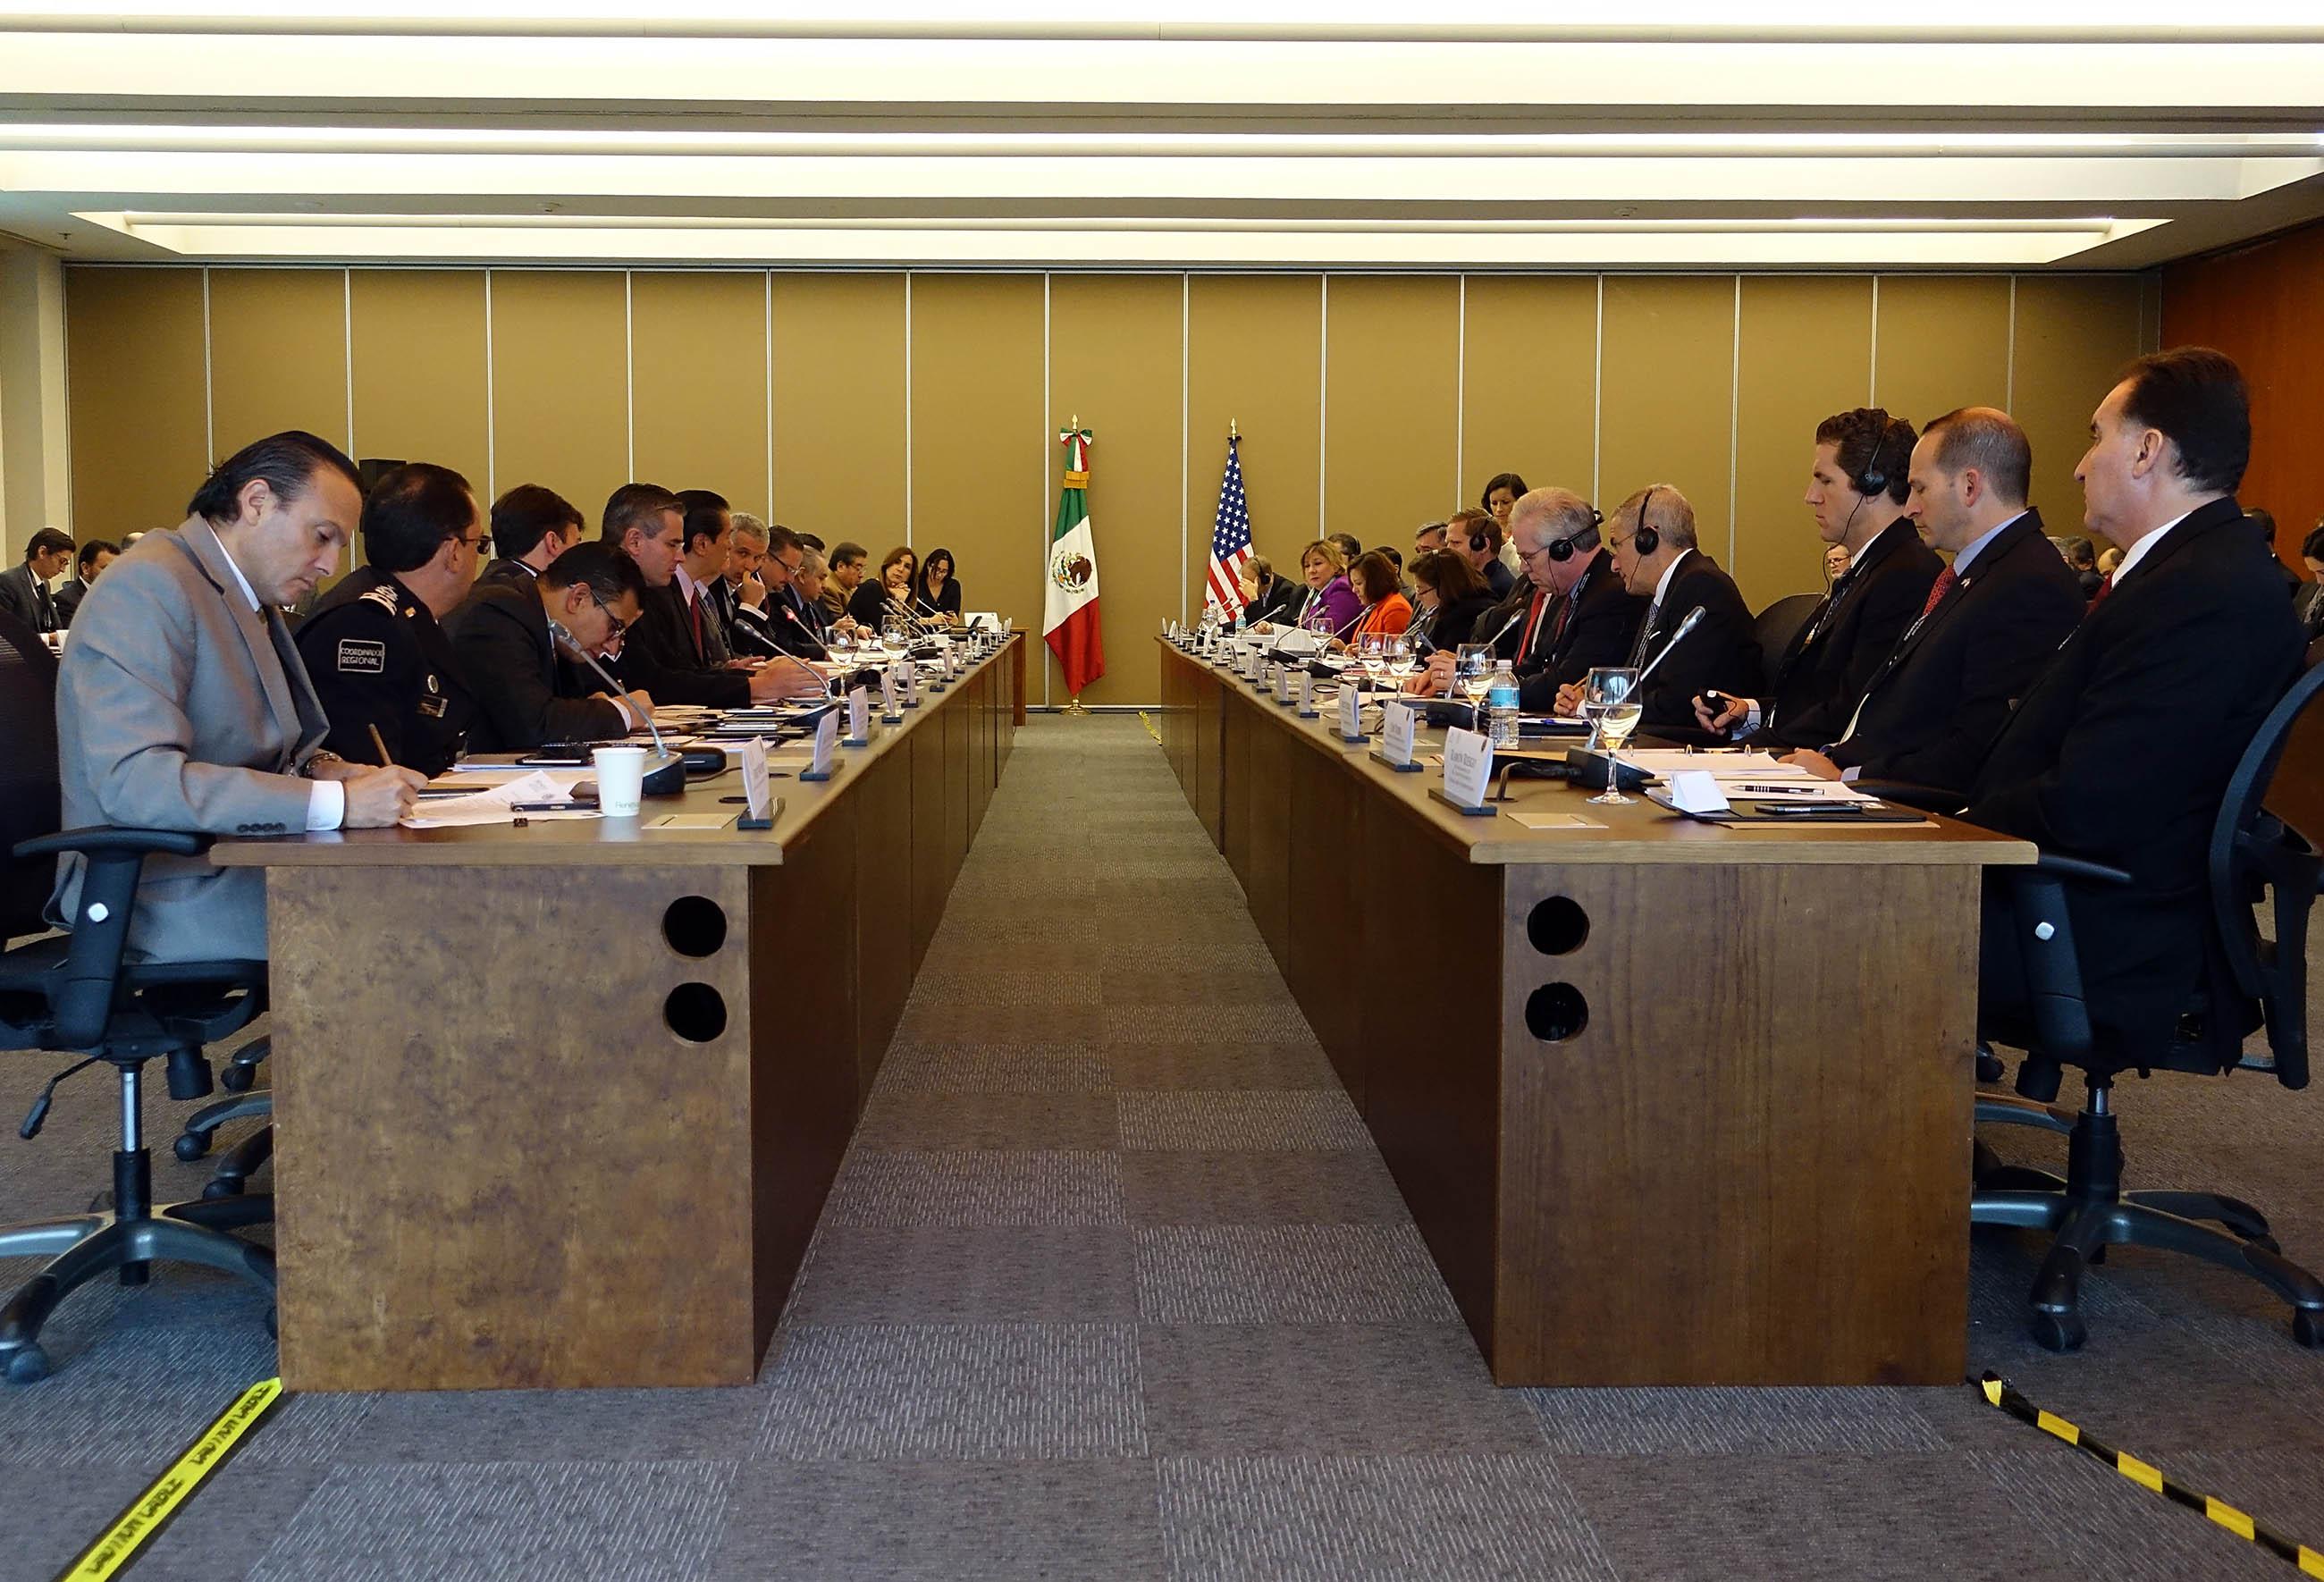 FOTO 1 Reuni n del Comit  Ejecutivo Bilateral de la Iniciativa para la Administraci n de la Frontera en el Siglo XXIjpg